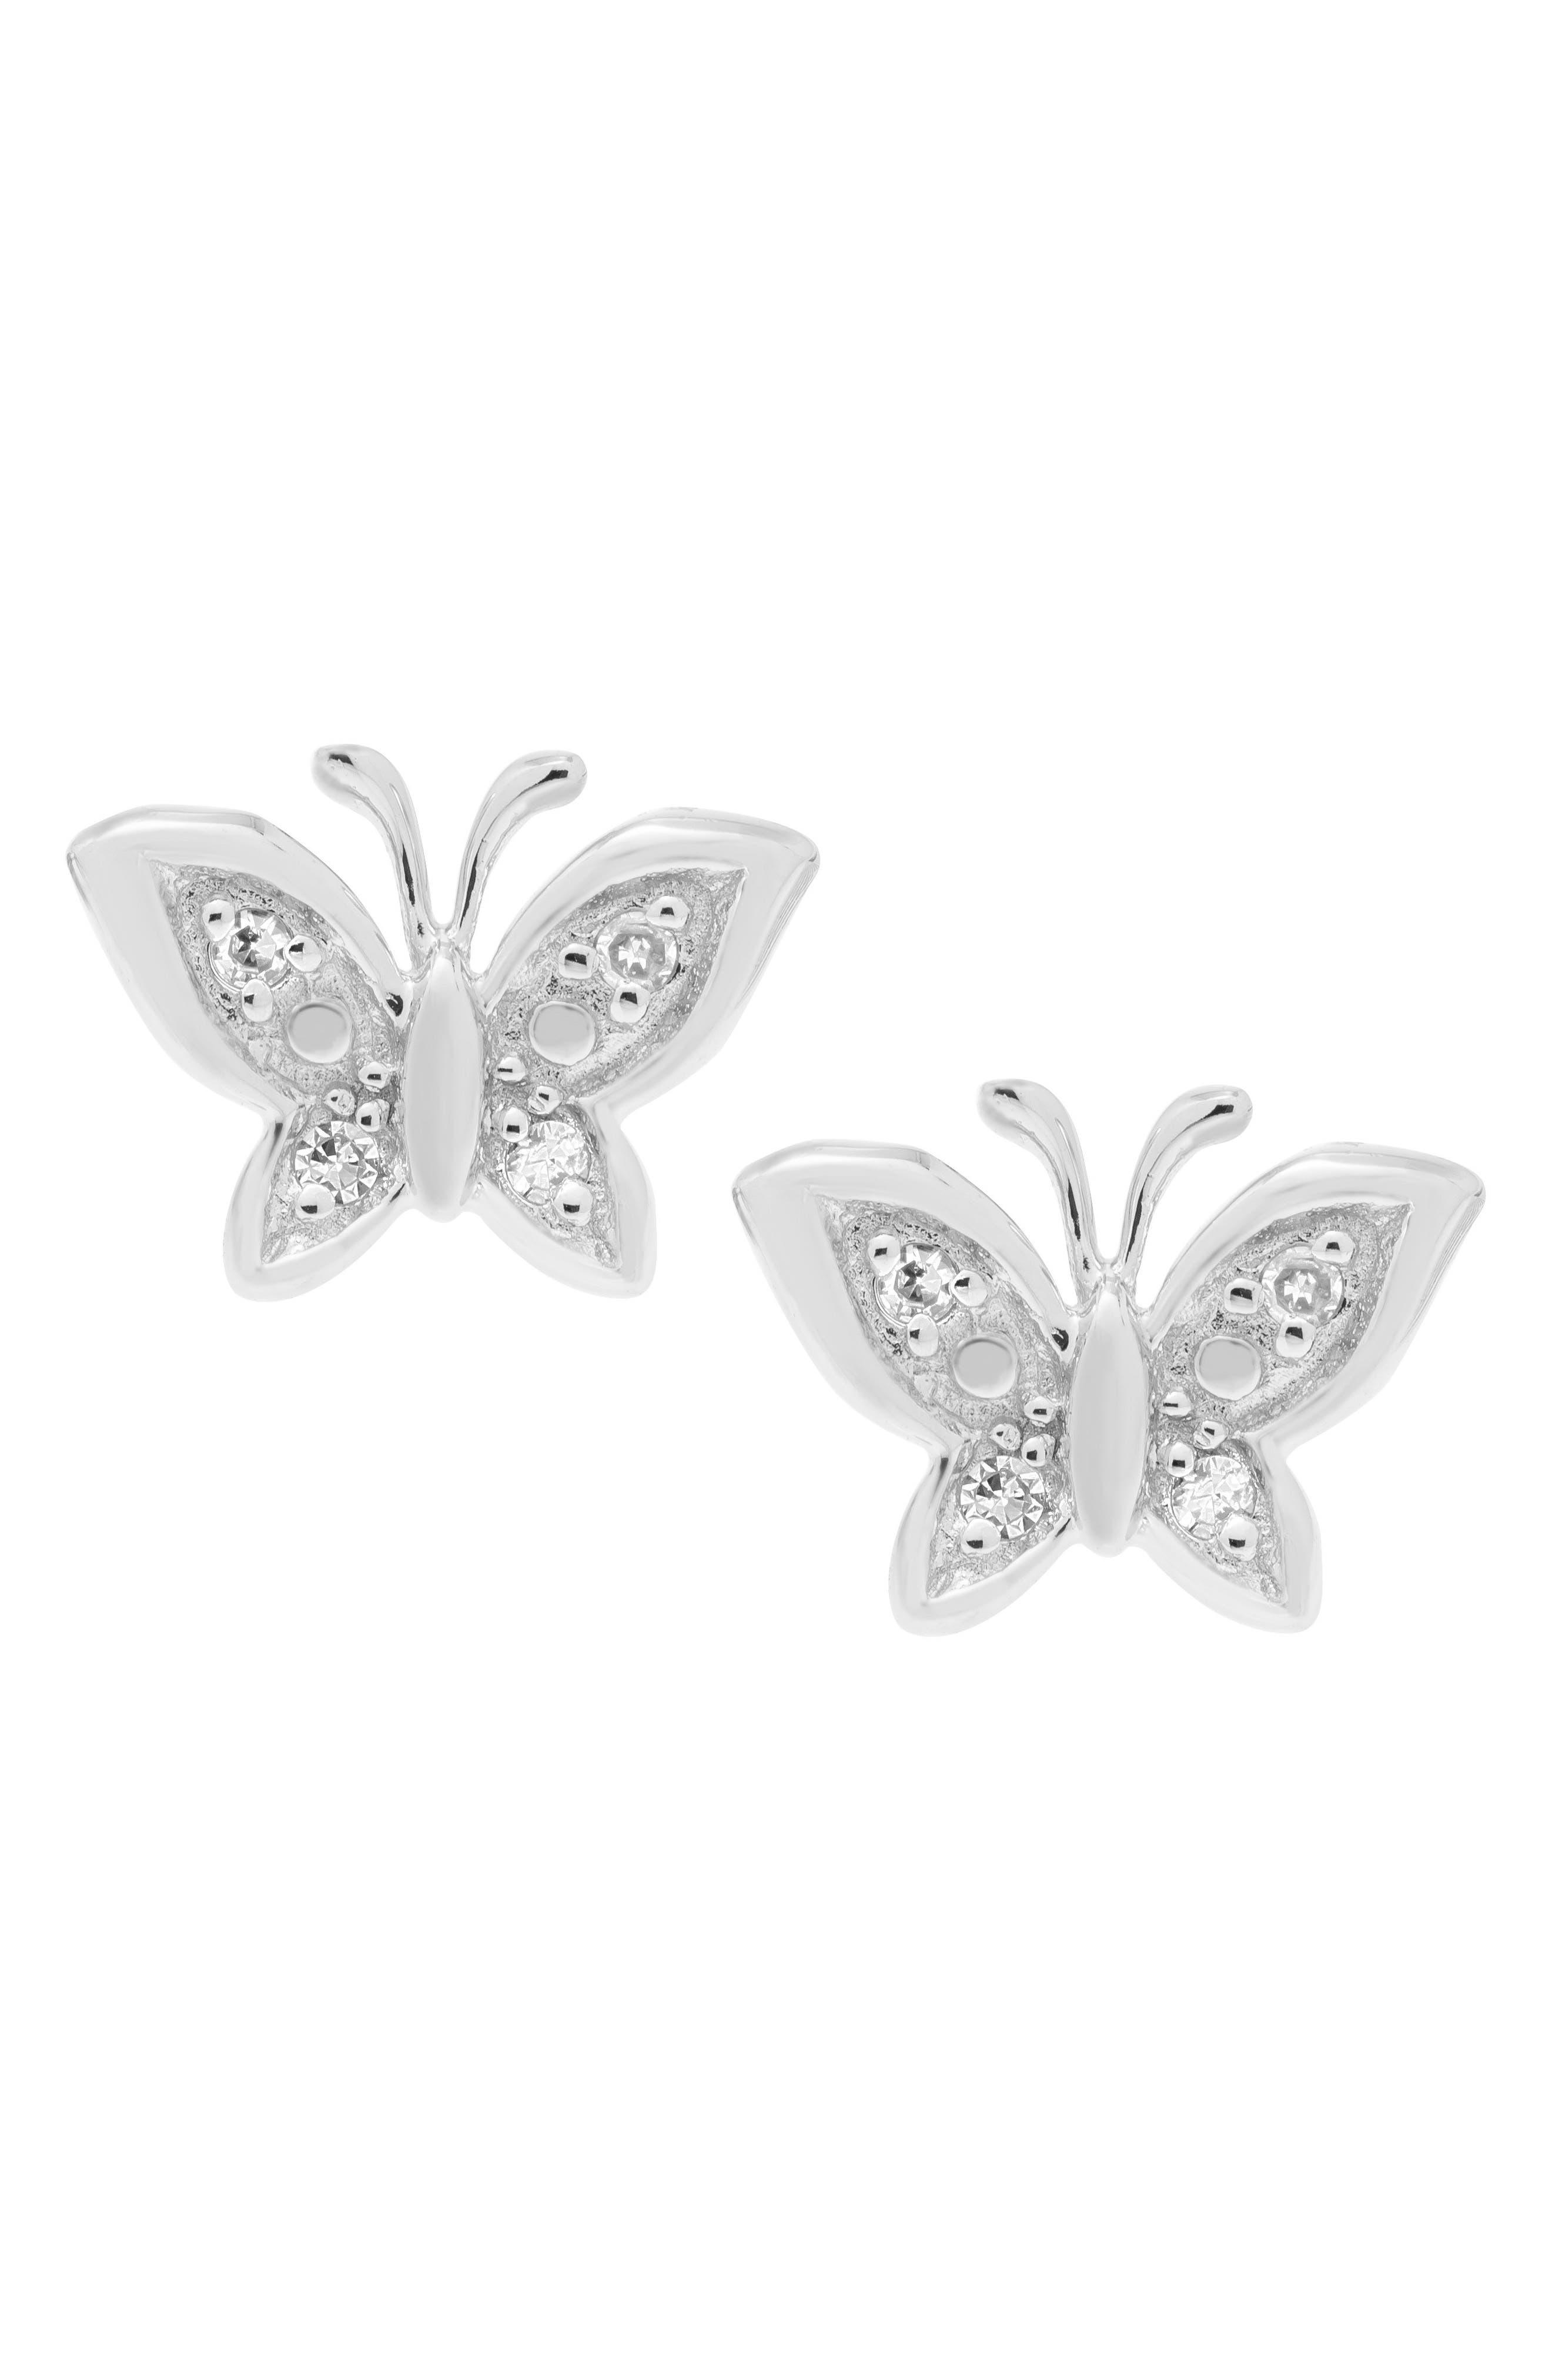 Sterling Silver & Diamond Butterfly Stud Earrings,                             Alternate thumbnail 2, color,                             SILVER